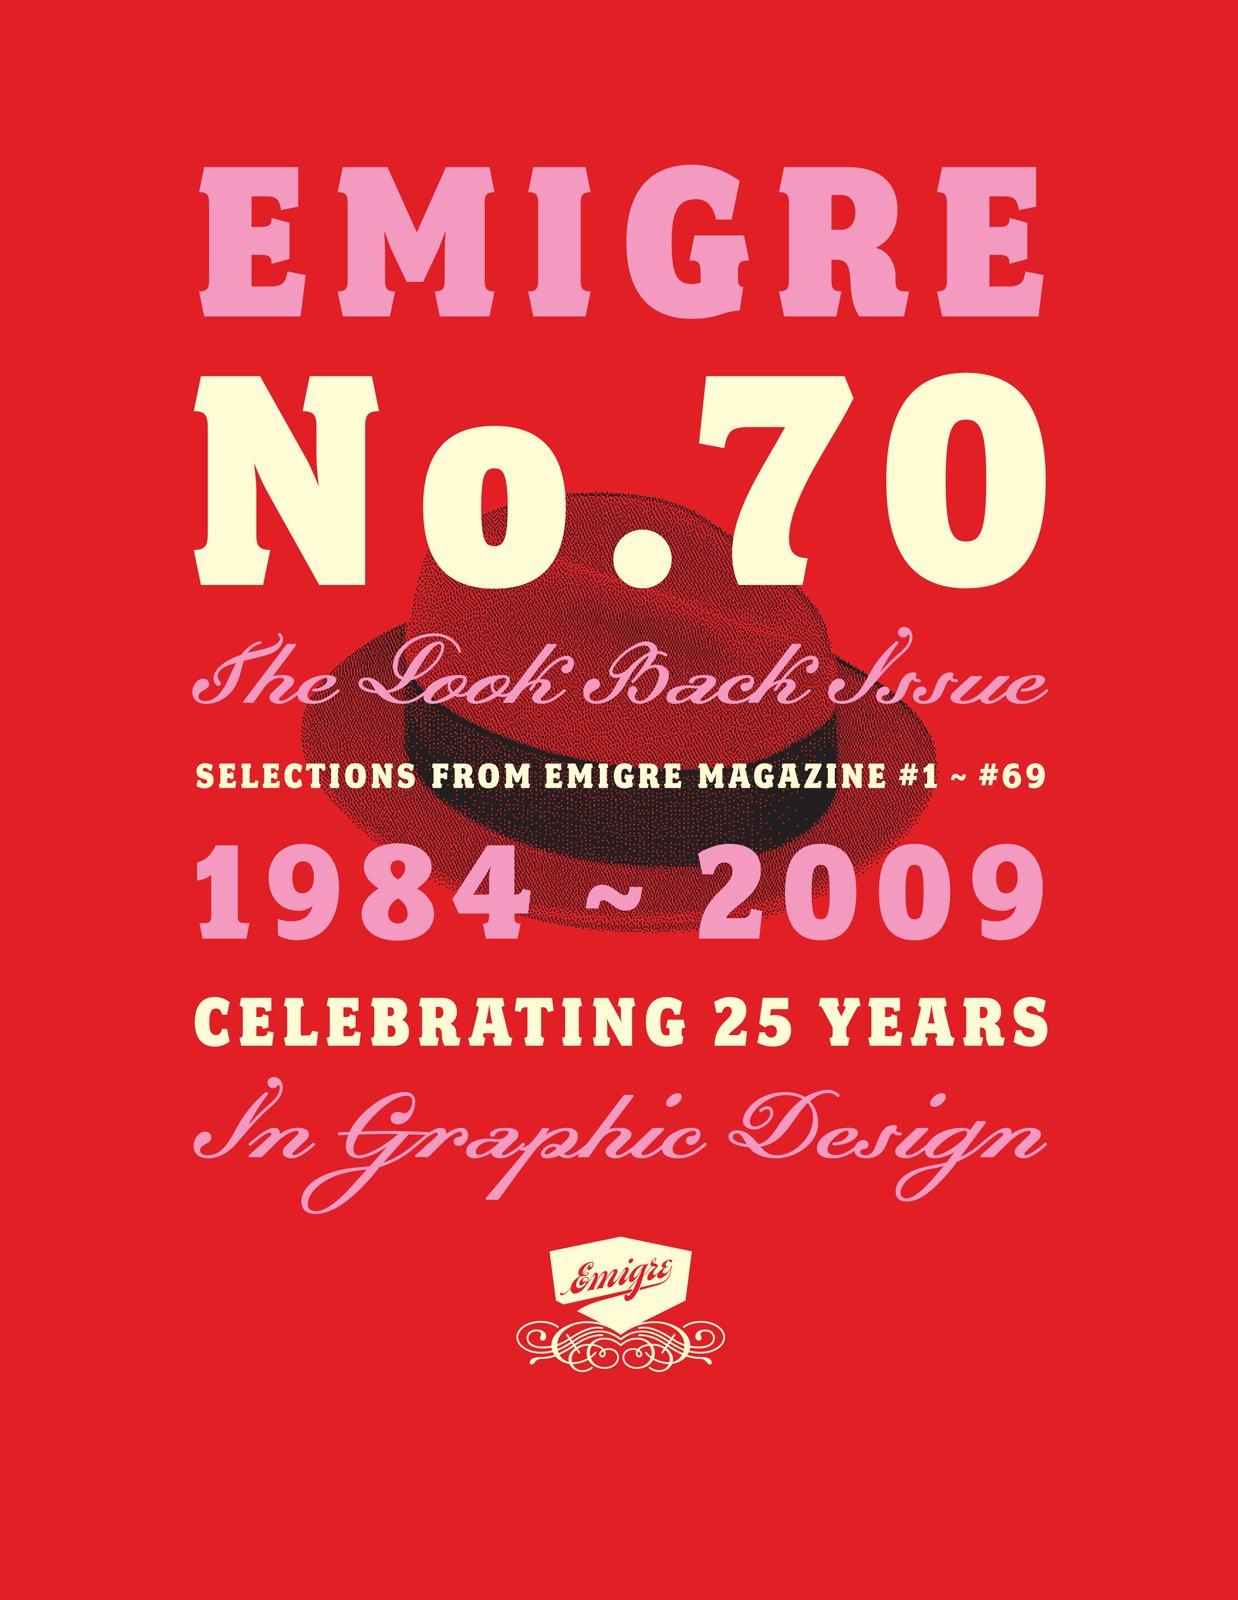 Emigre No. 70, cover  Photo 1 of 9 in Emigre No. 70